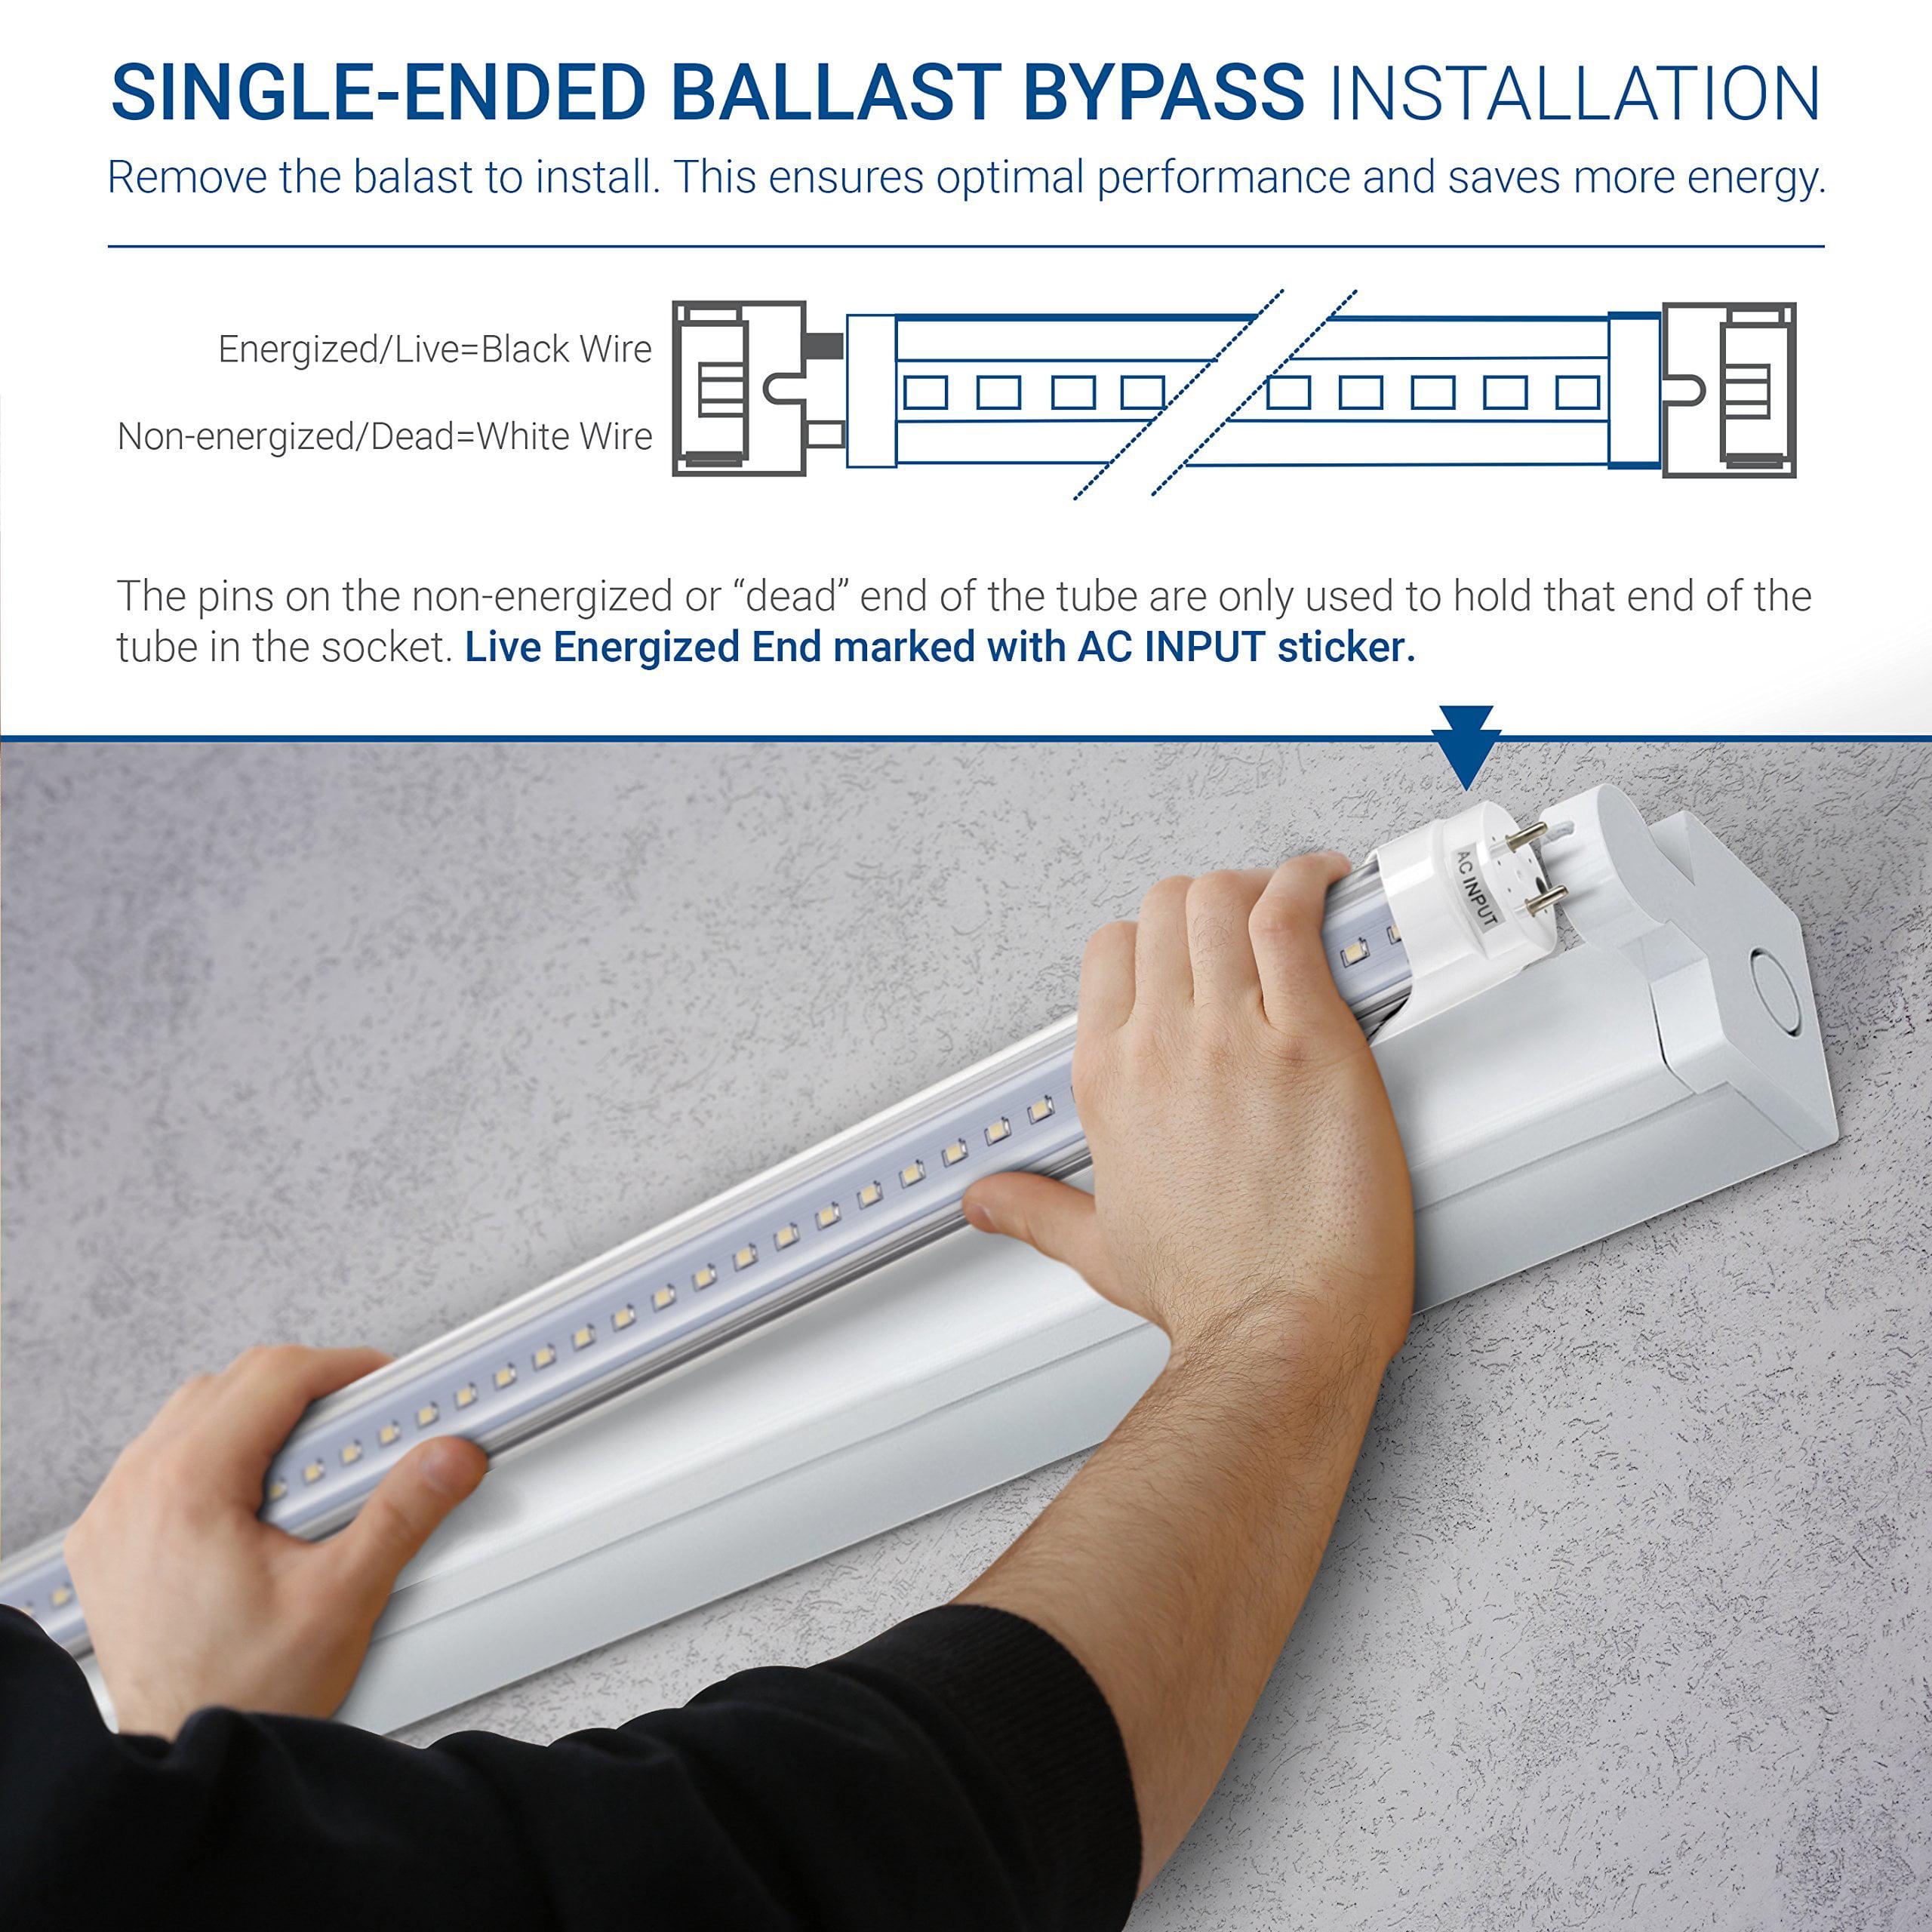 Glass T10 T12 Light 18W Hyperikon T8 4 Foot LED Tube 40 Watt Replacement